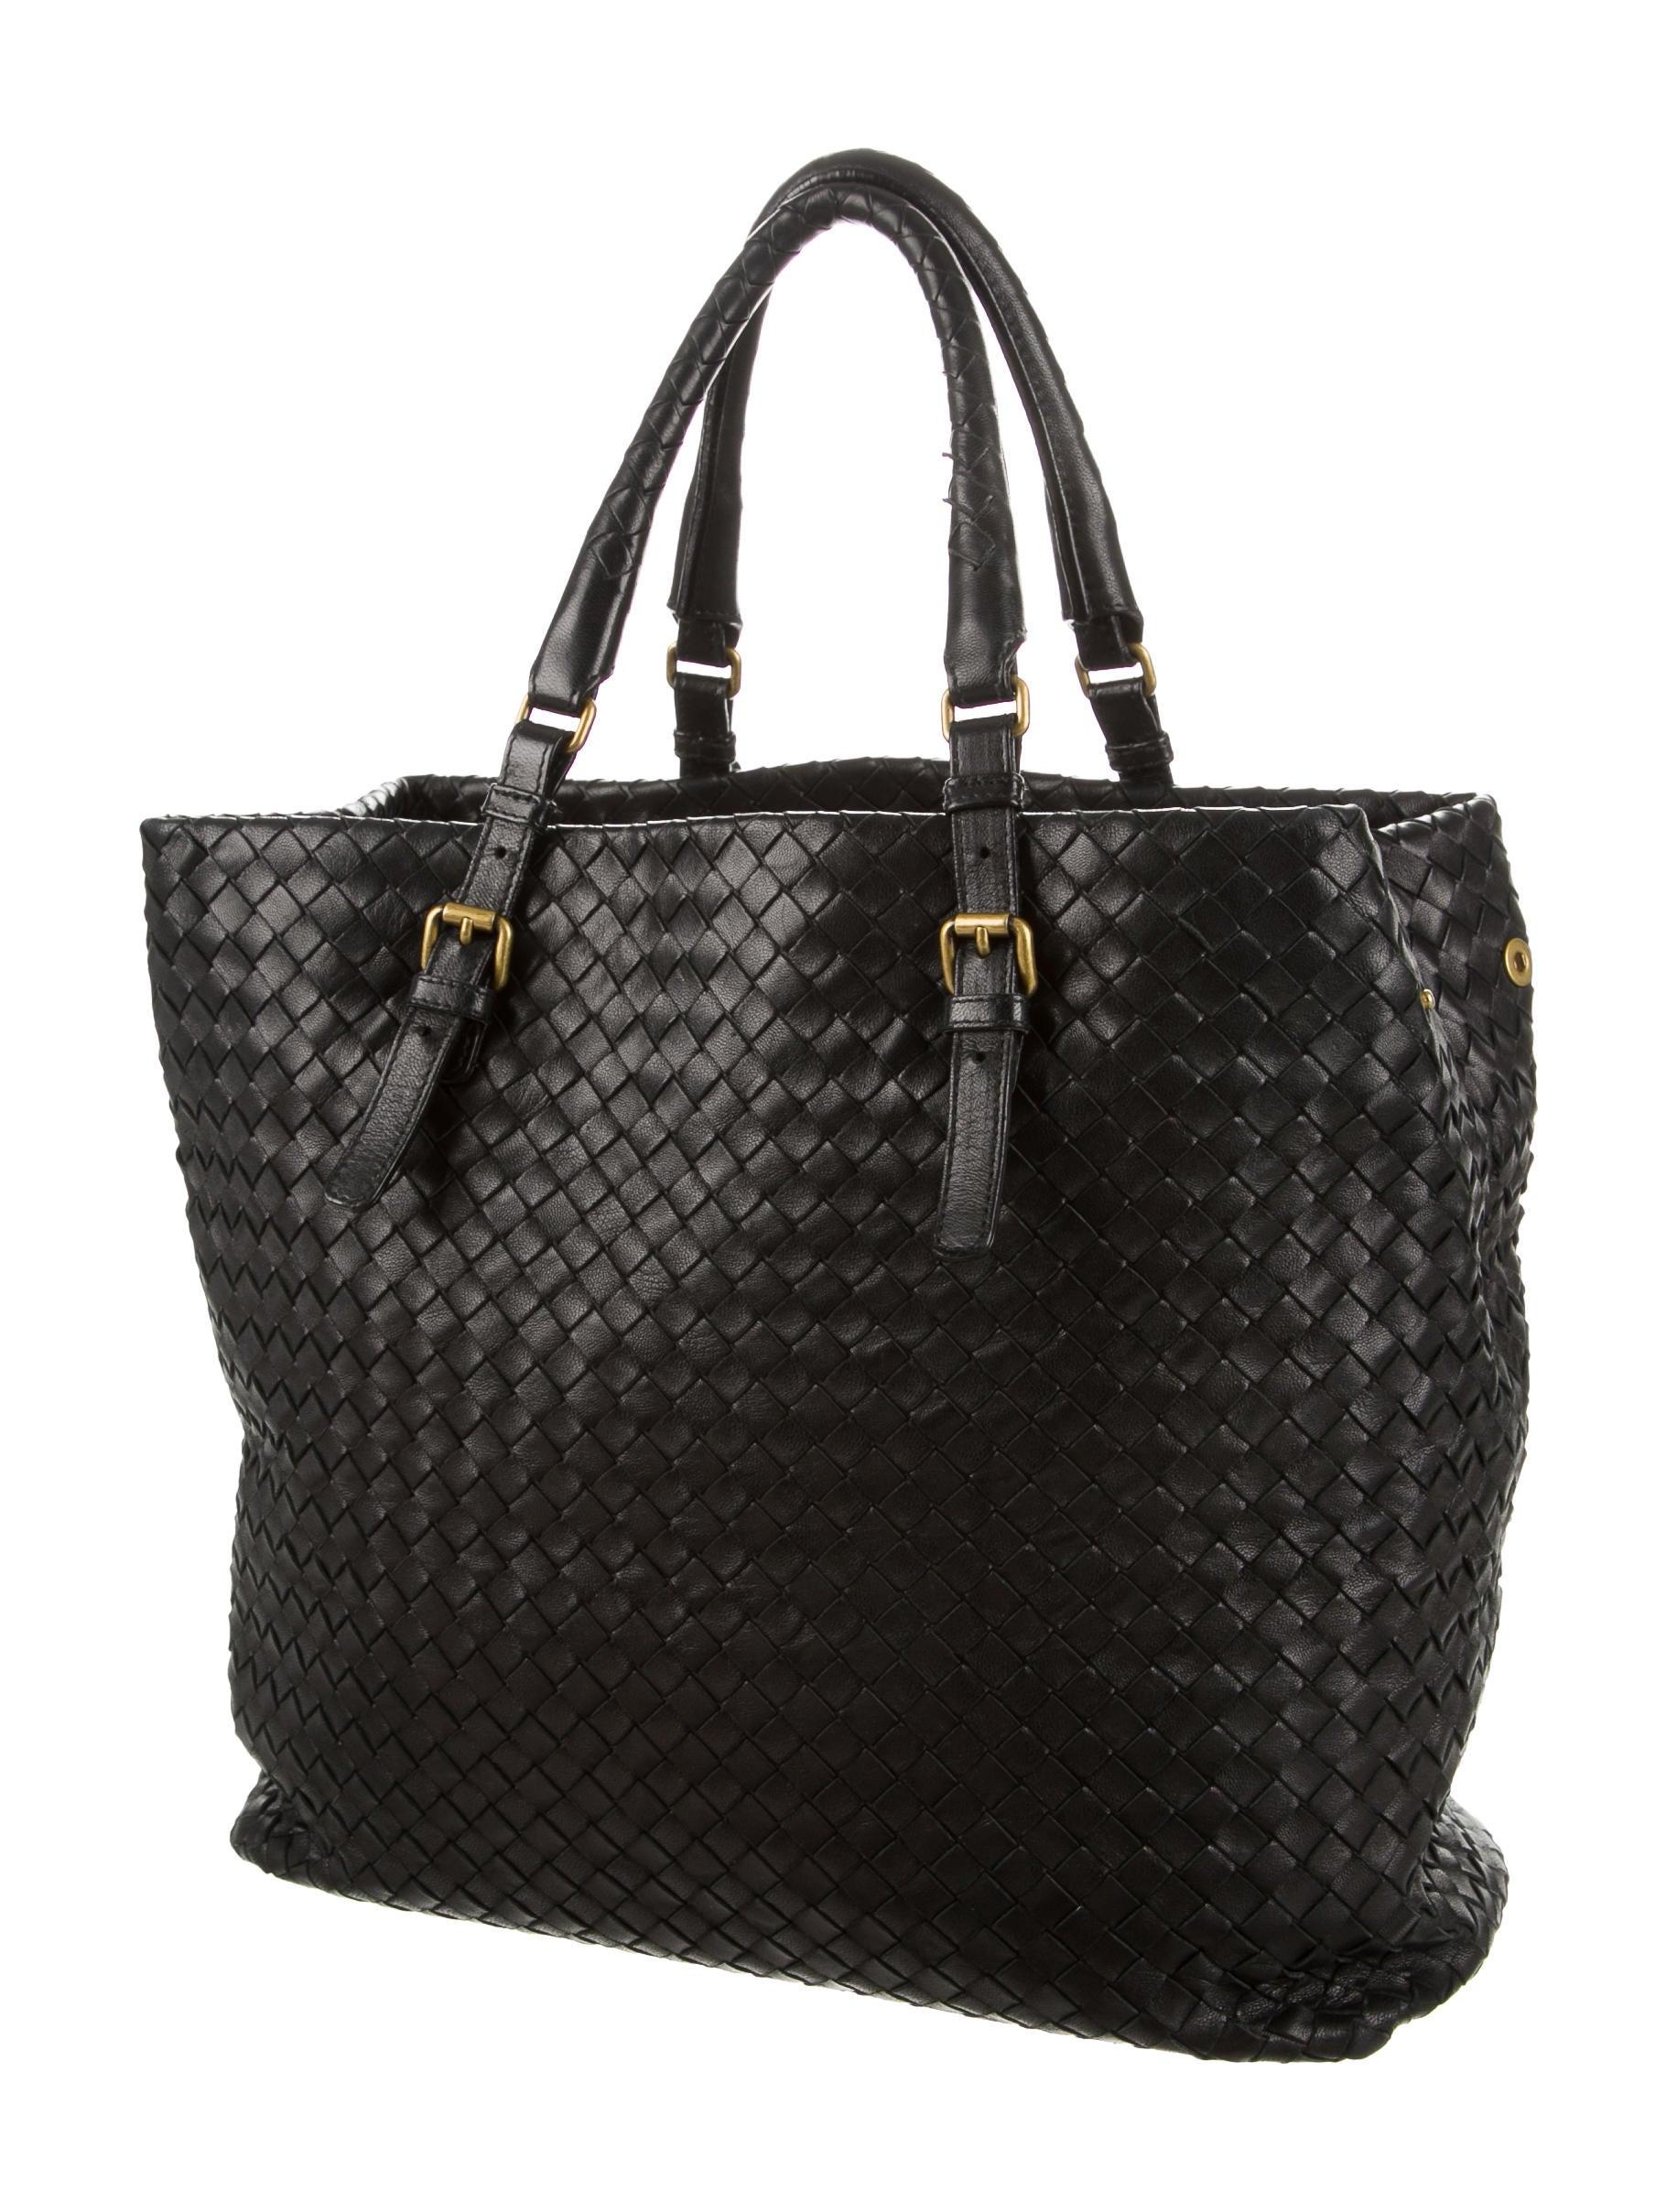 Bottega veneta intrecciato tote bag handbags bot38678 the realreal - Mobili bottega veneta ...